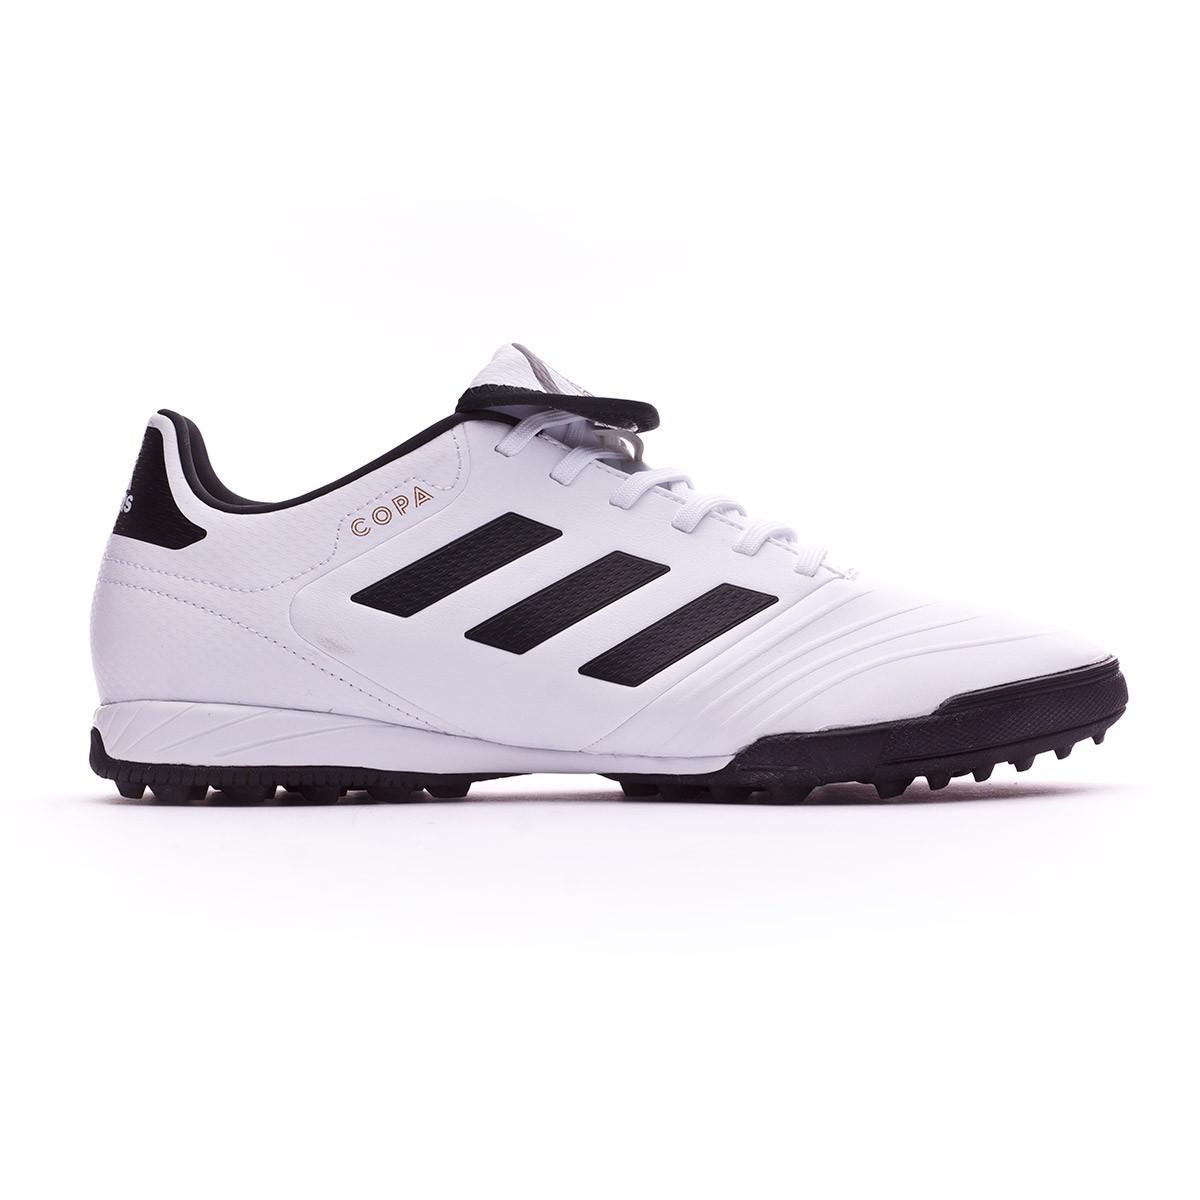 84c55b78d8b Football Boot adidas Copa Tango 18.3 Turf White-Core black-Gold metallic -  Tienda de fútbol Fútbol Emotion